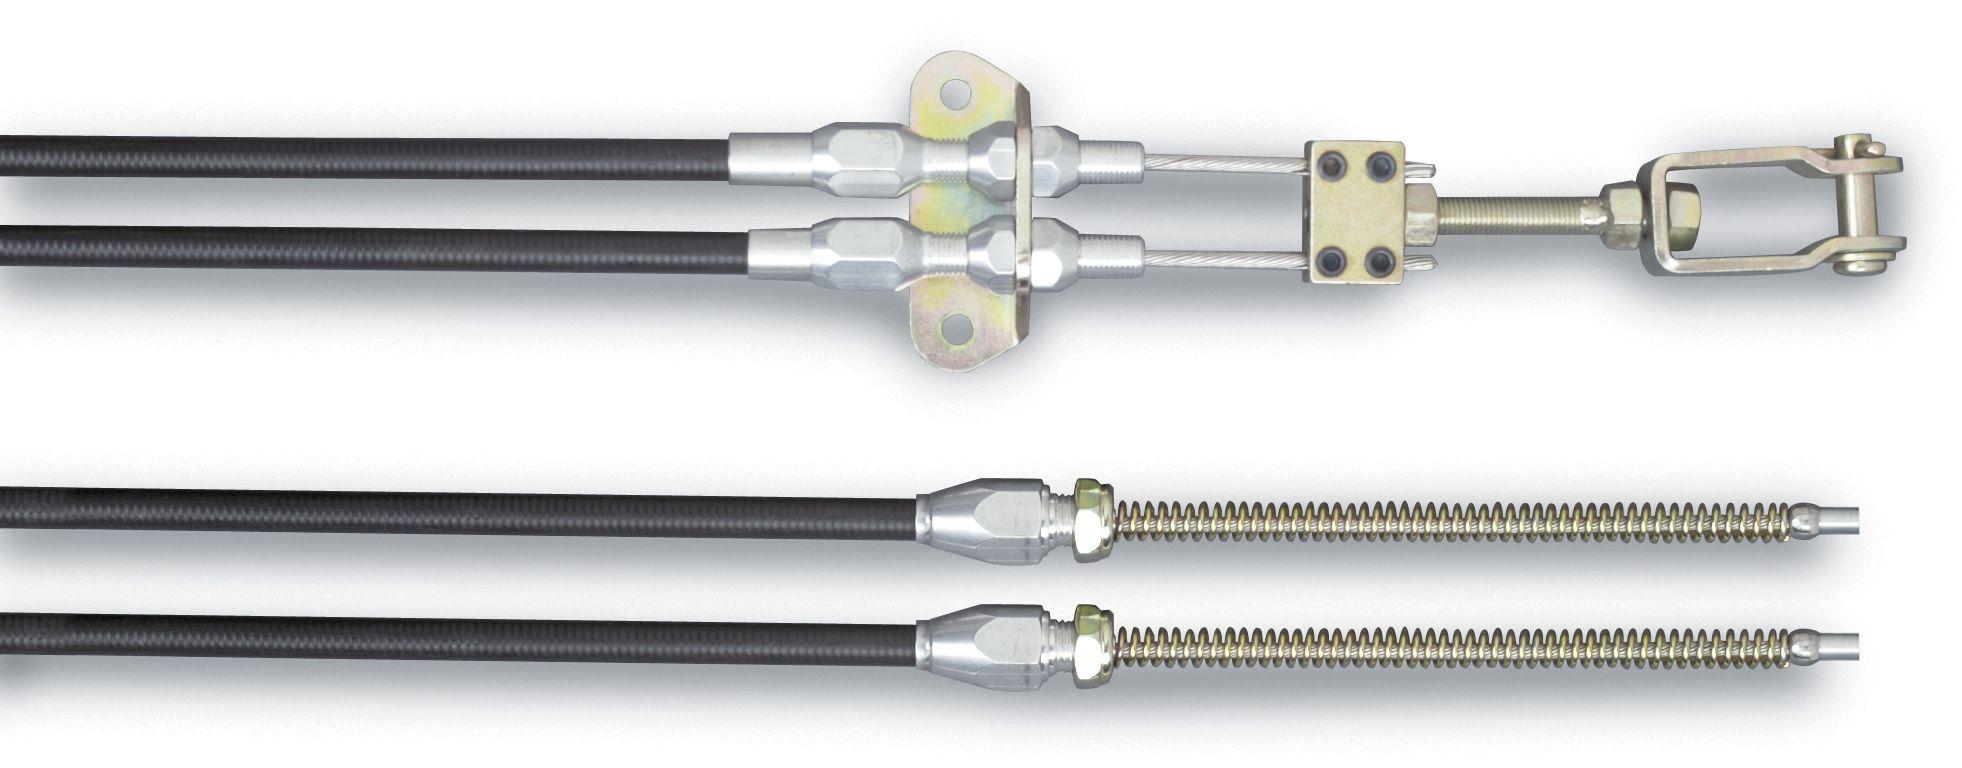 Lokar Floor Mount Emergency Brake Cables Brake Hand Brake Car Care Cleaning